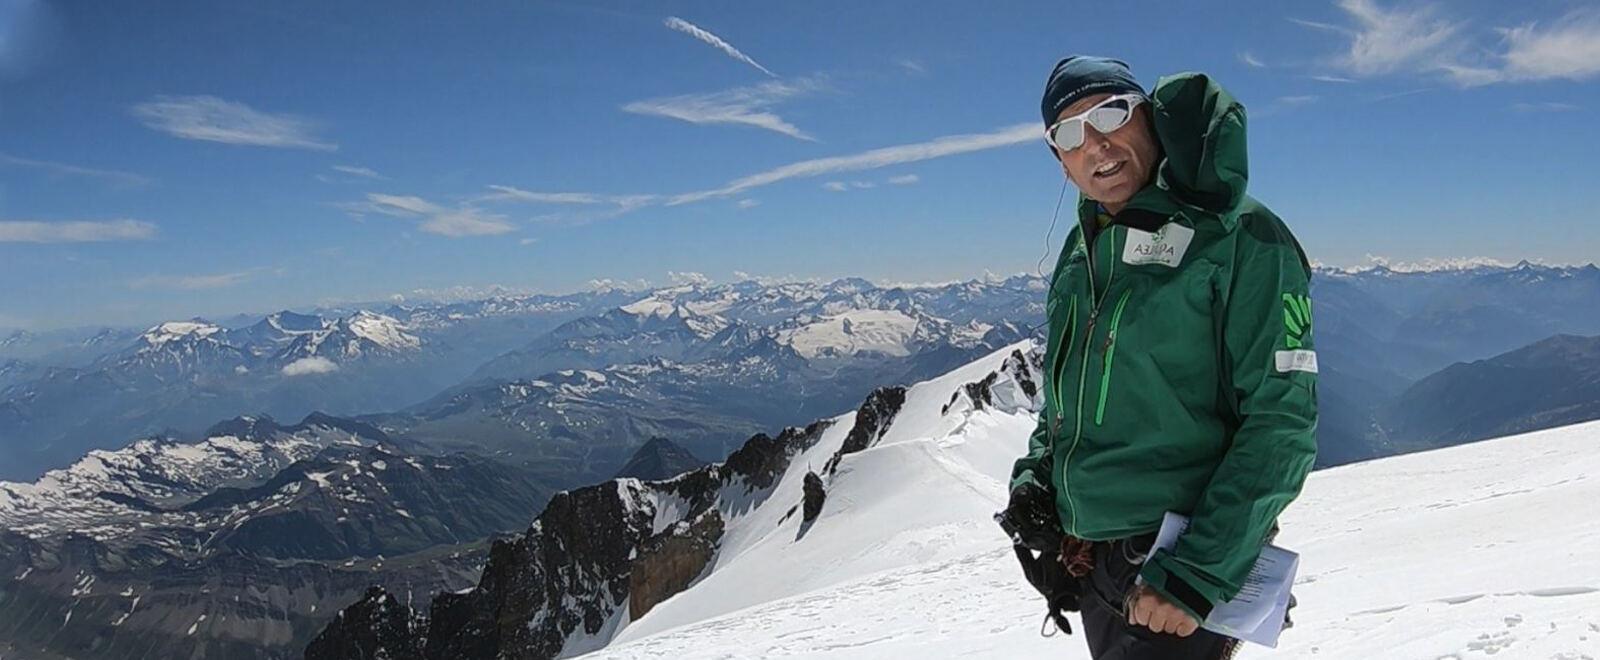 Skiing - la poire